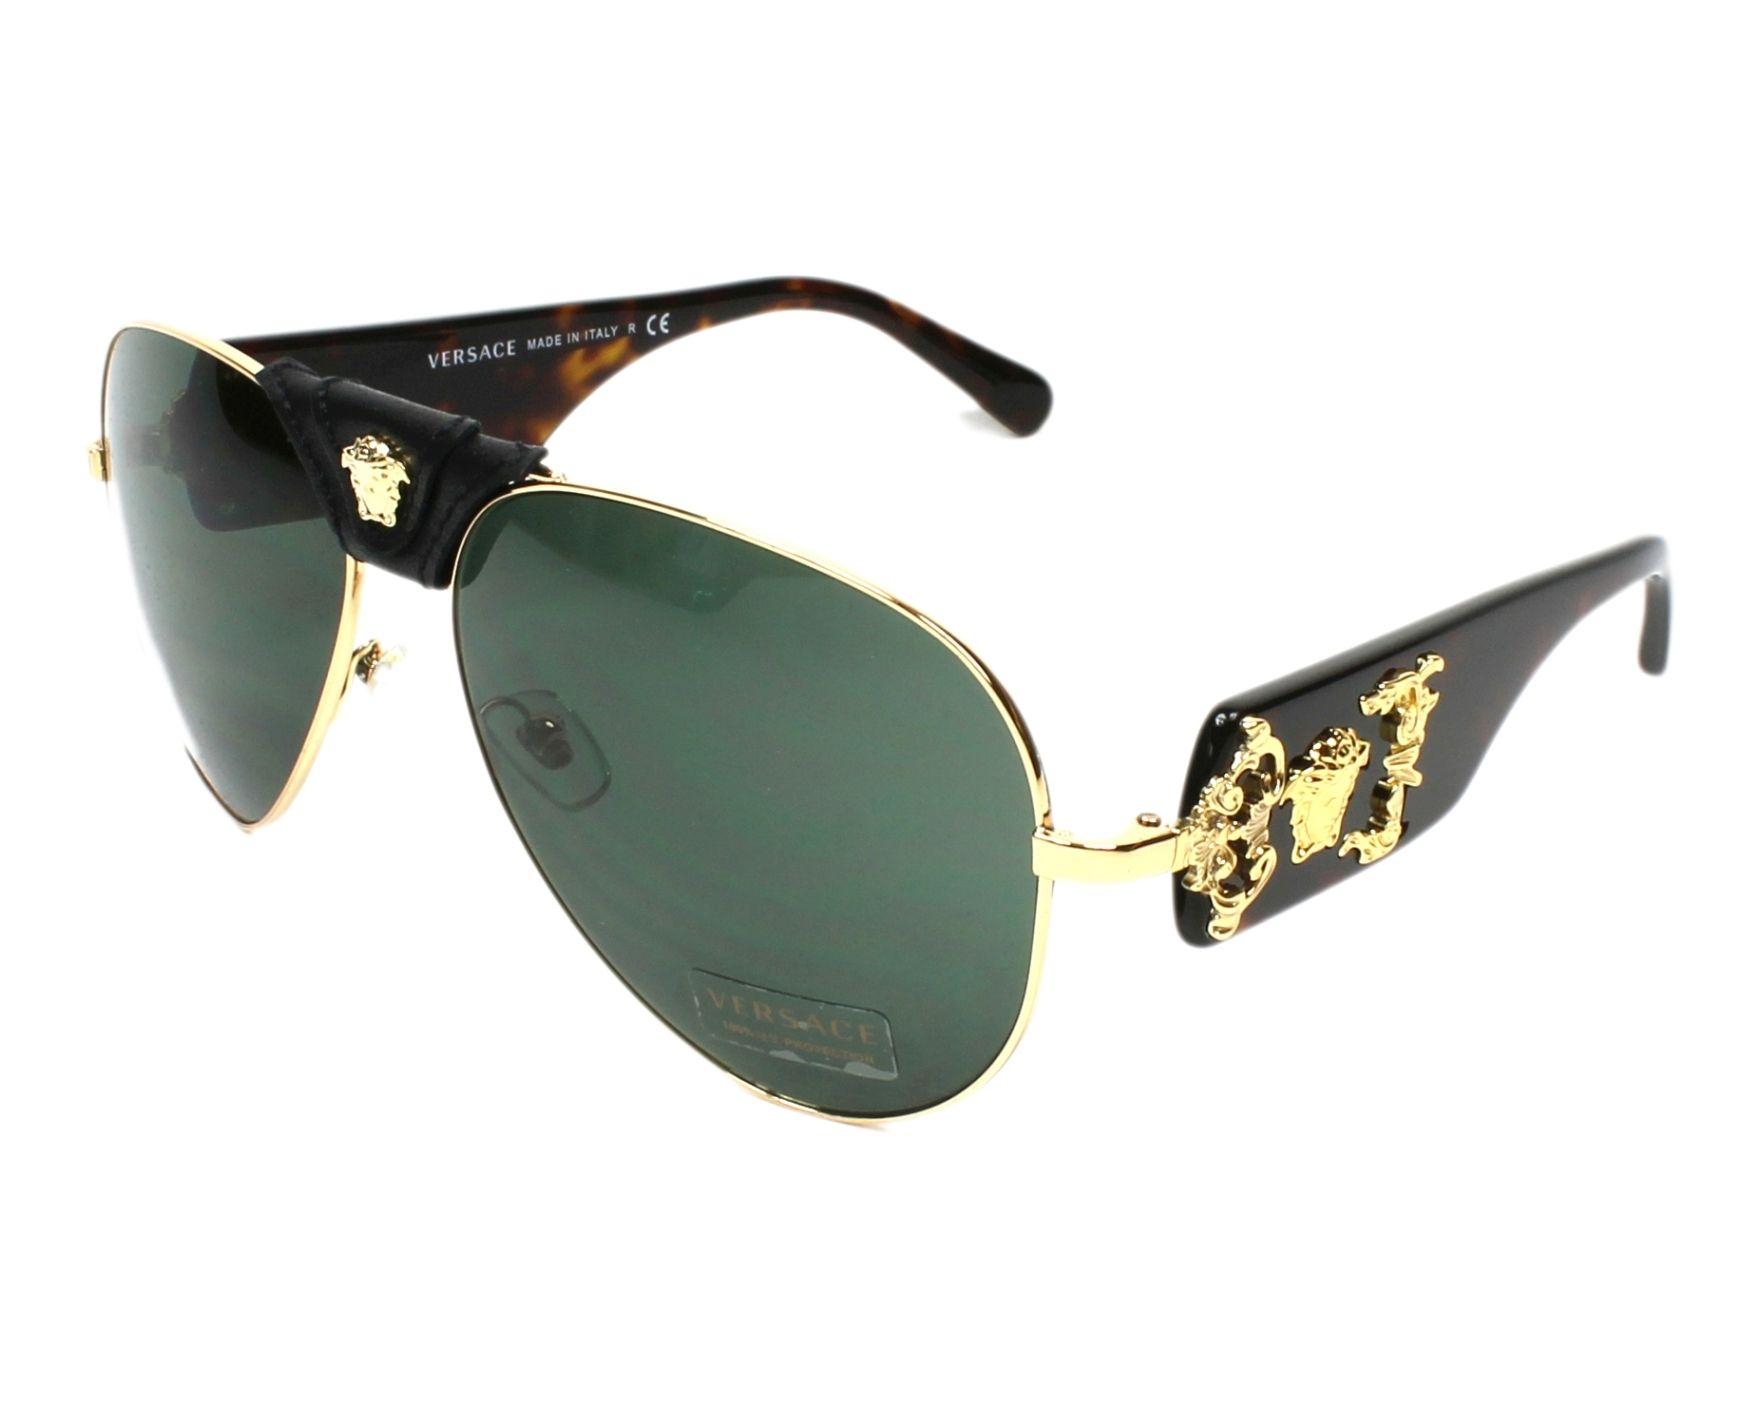 d6a1965ece105 Sunglasses Versace VE-2150-Q 1002 71 62-14 Gold Black profile